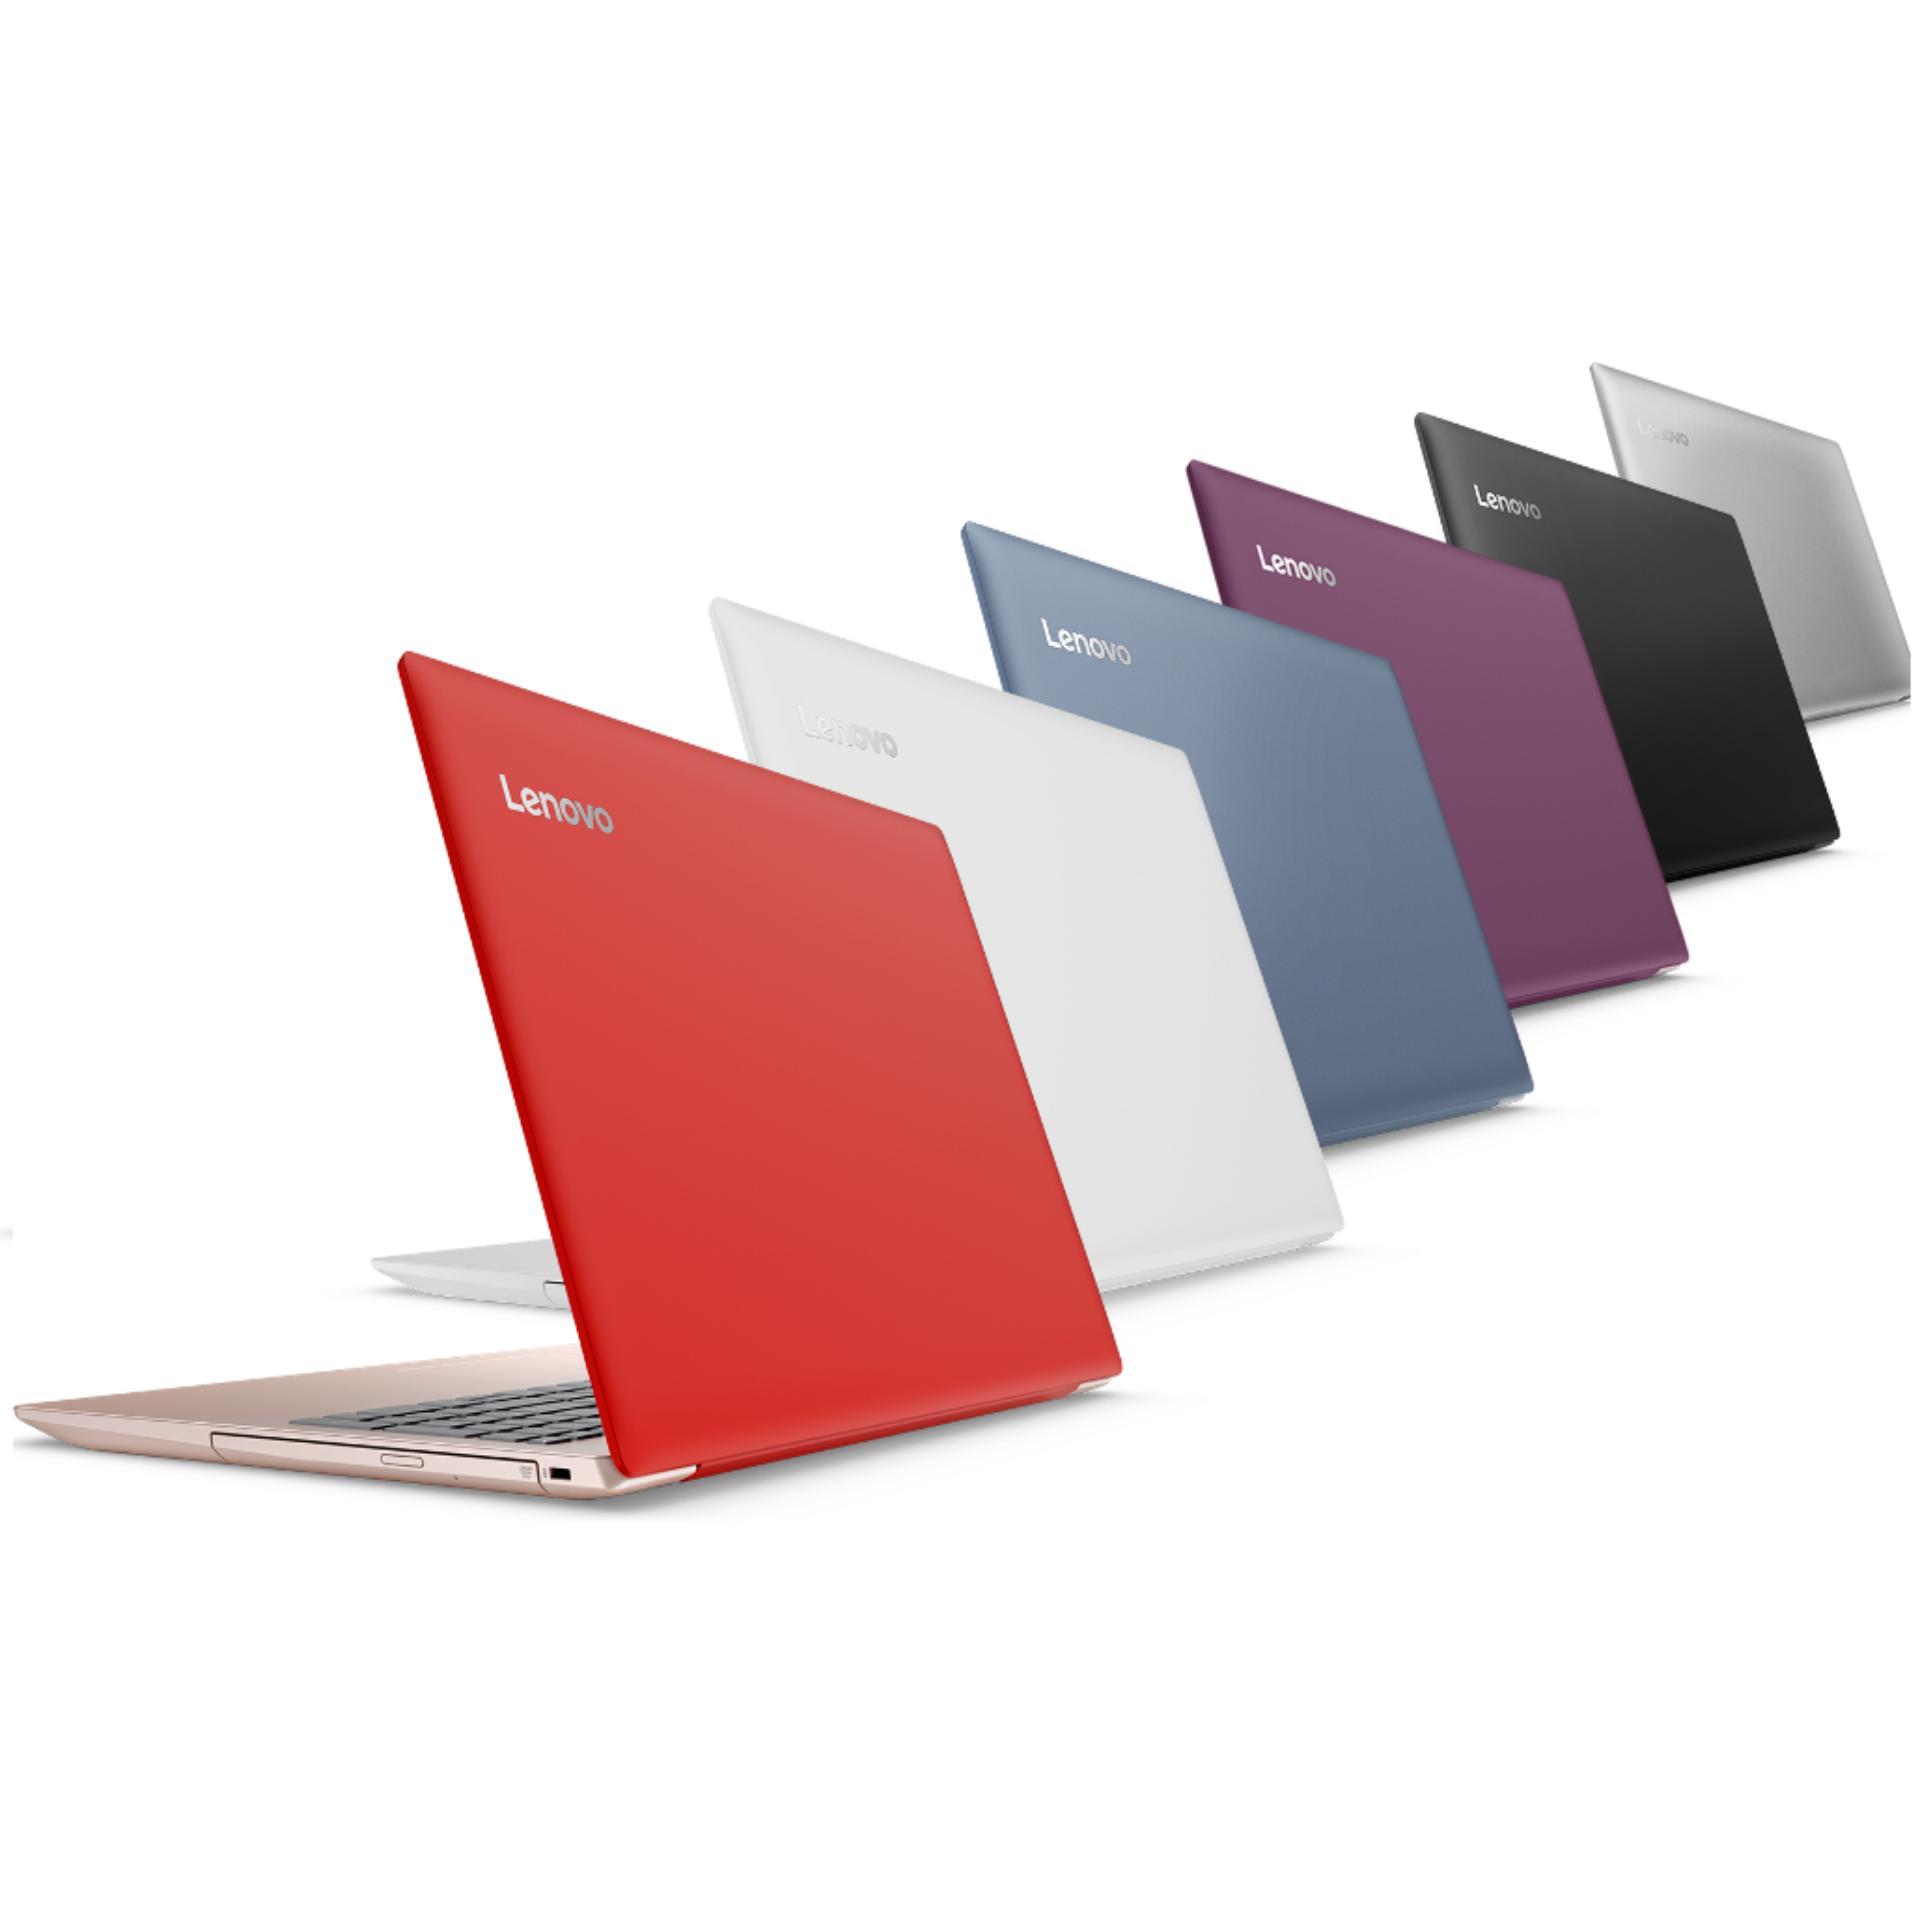 Terbaik Murah Lenovo Ideapad 320 Resmi Intel Core I5 7200u 4gb 1tb 305 Win10 I3 5005 M330 2gb 14 Silver Nvidia